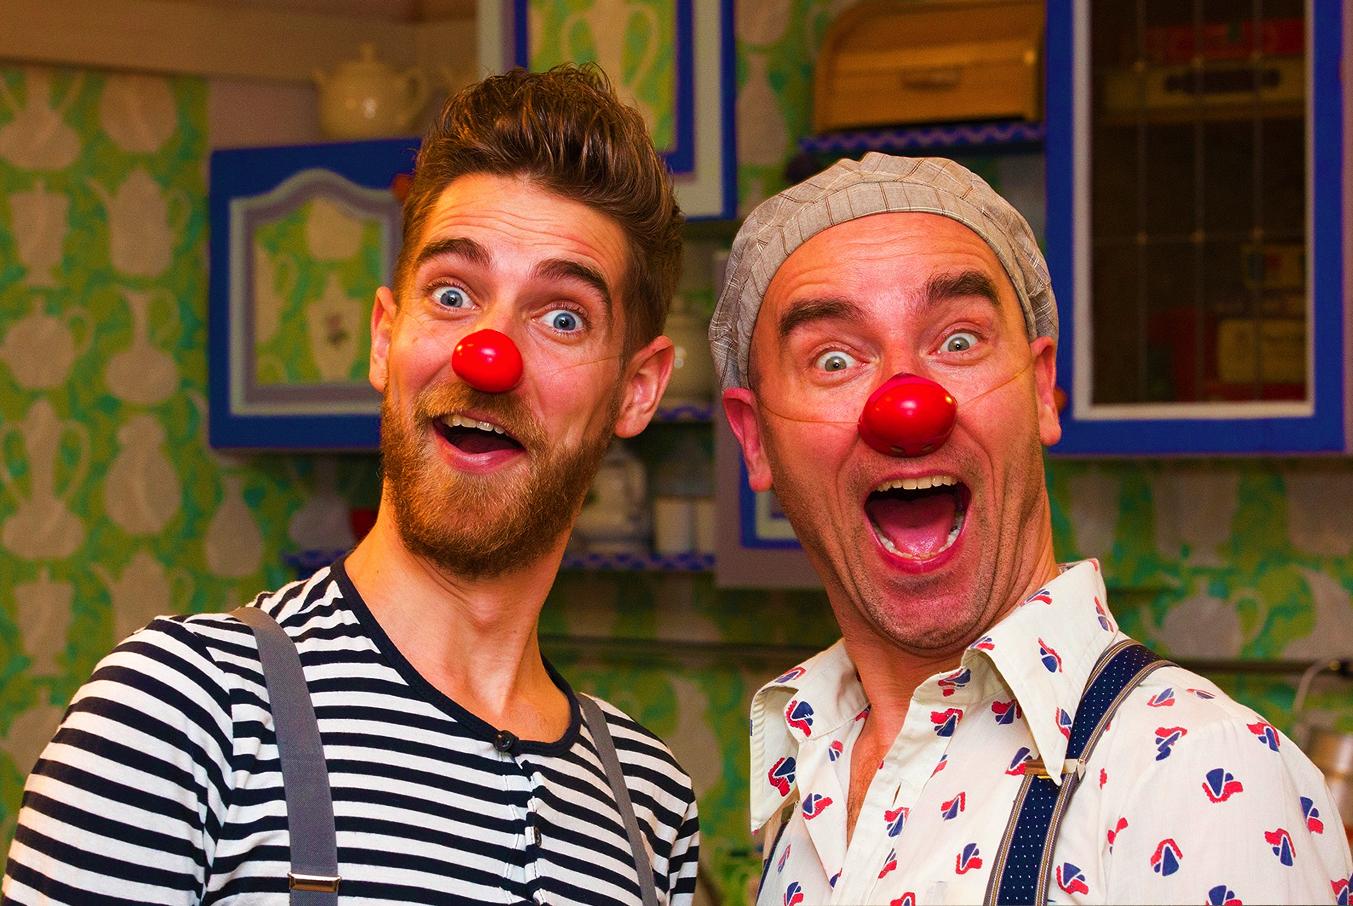 Twee clowns van CliniClowns kijken verbaast